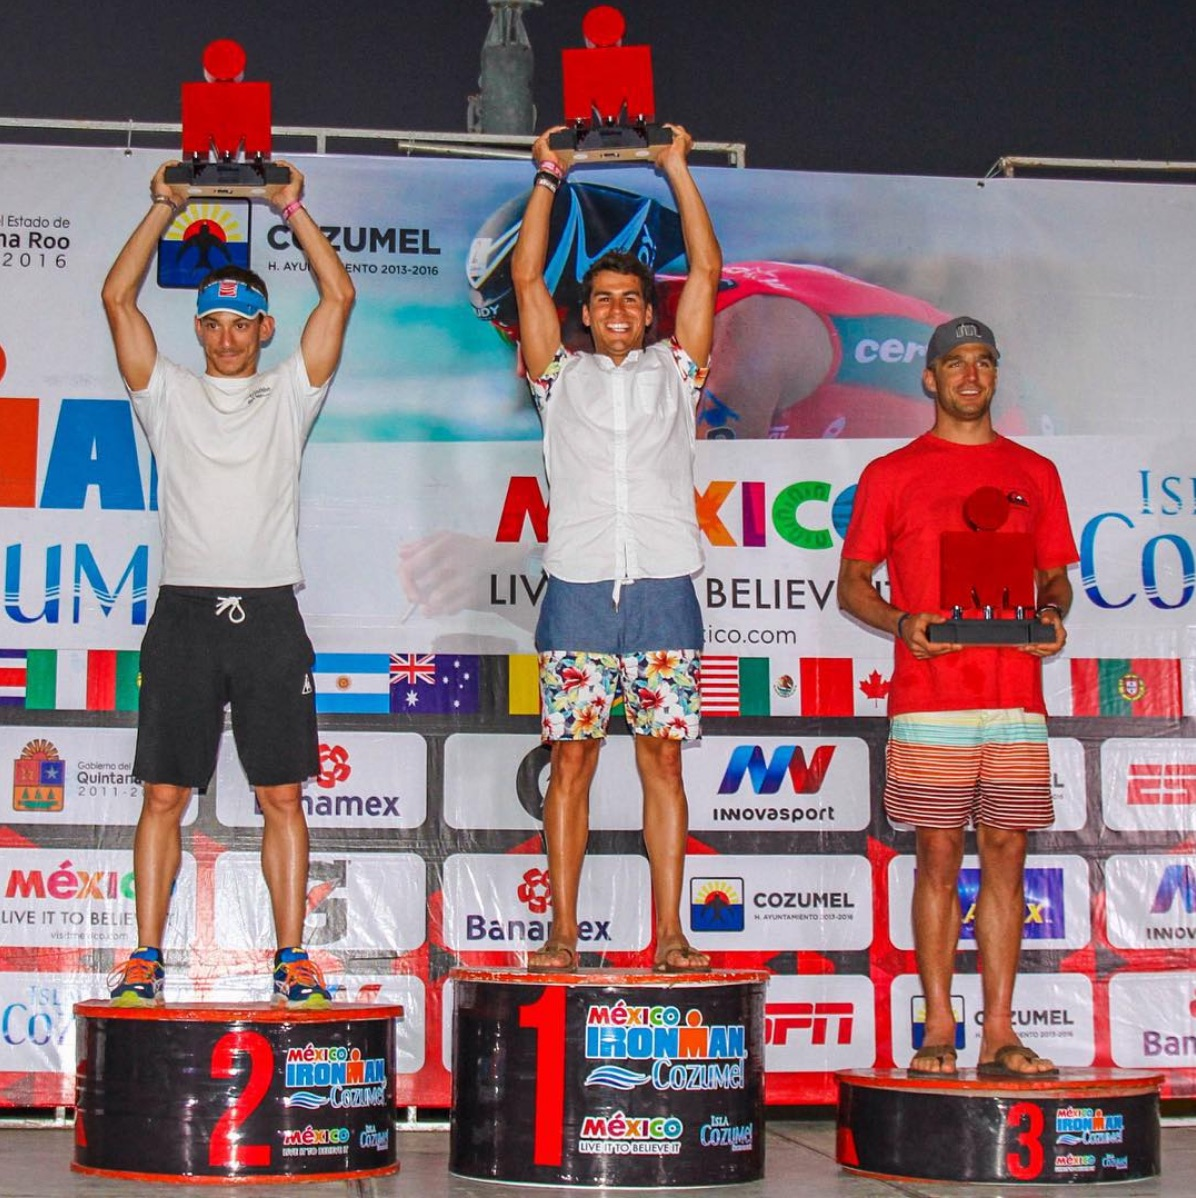 Ironman Cozumel 3